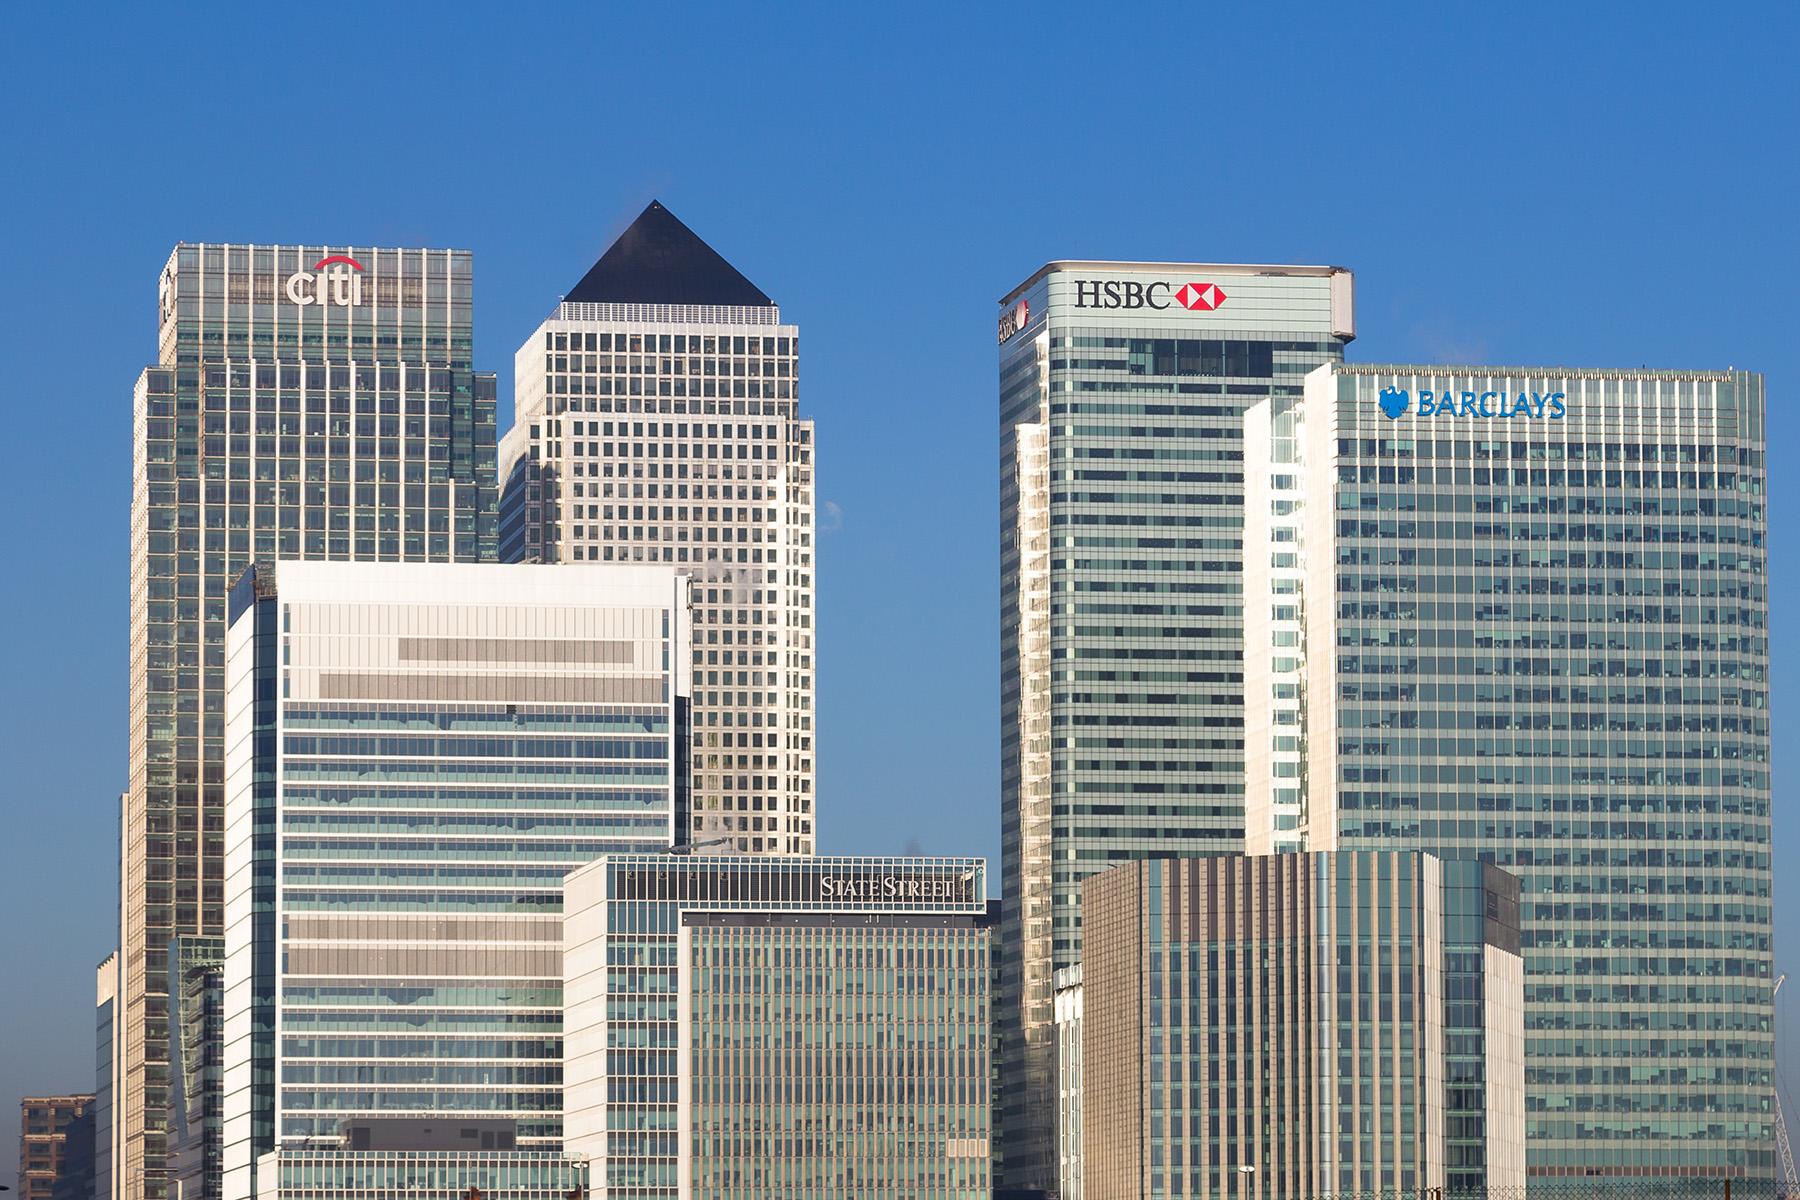 International banks at Canary Wharf